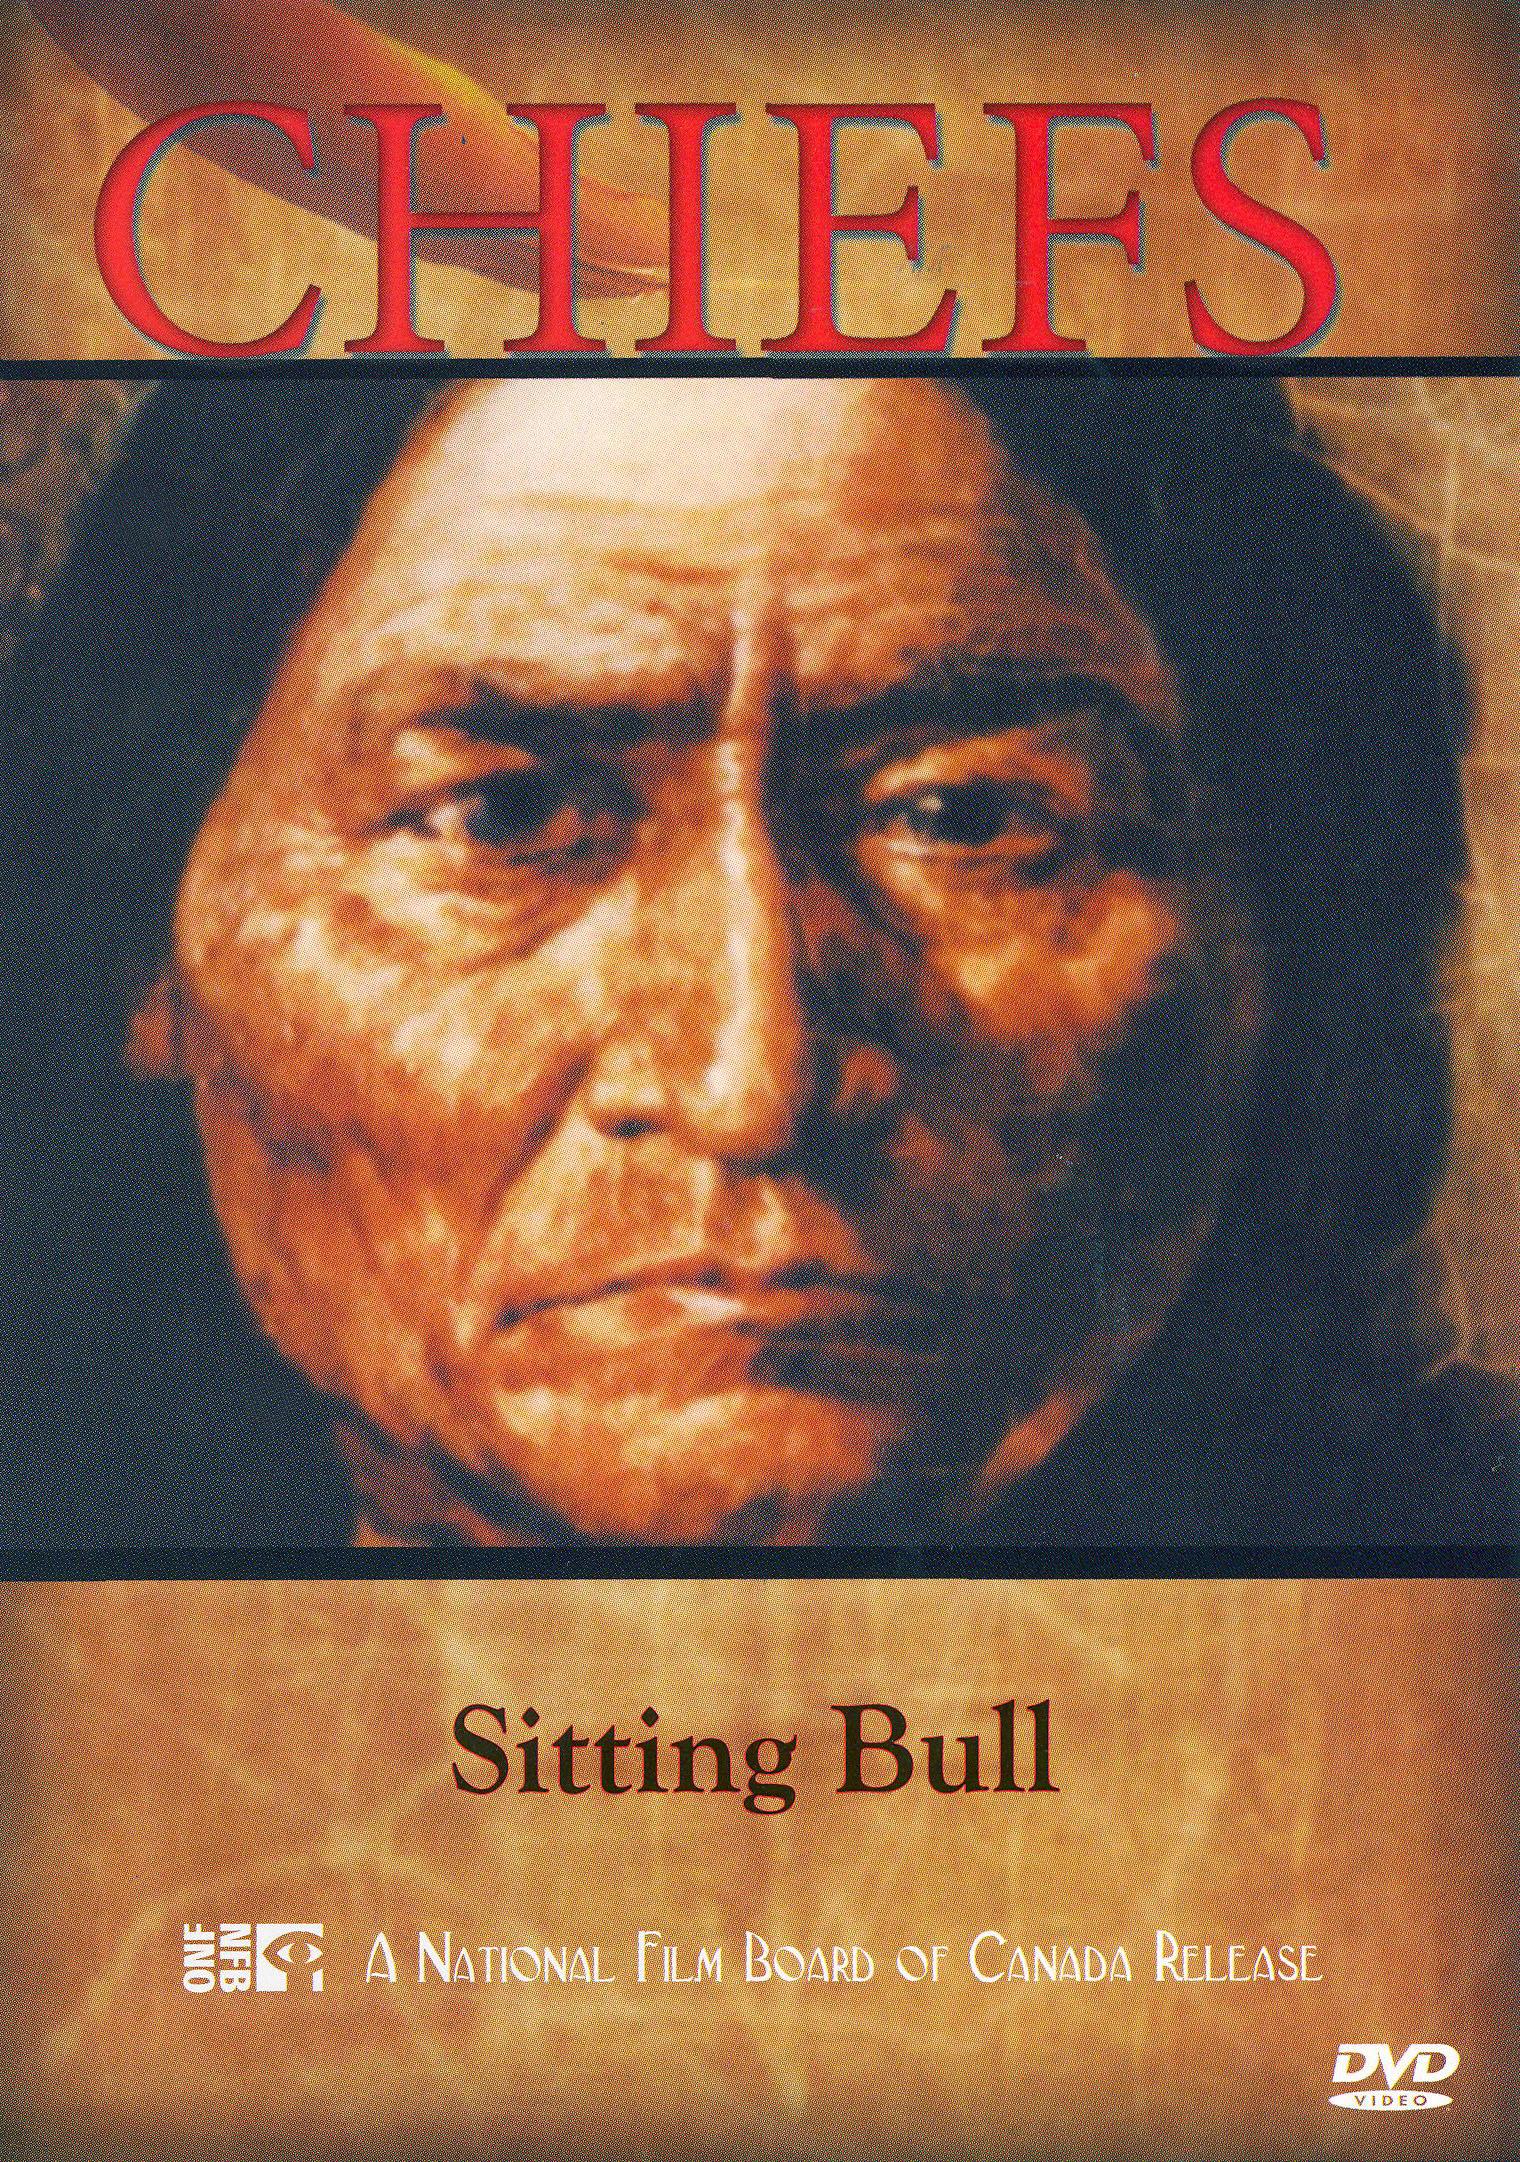 Chiefs: Sitting Bull